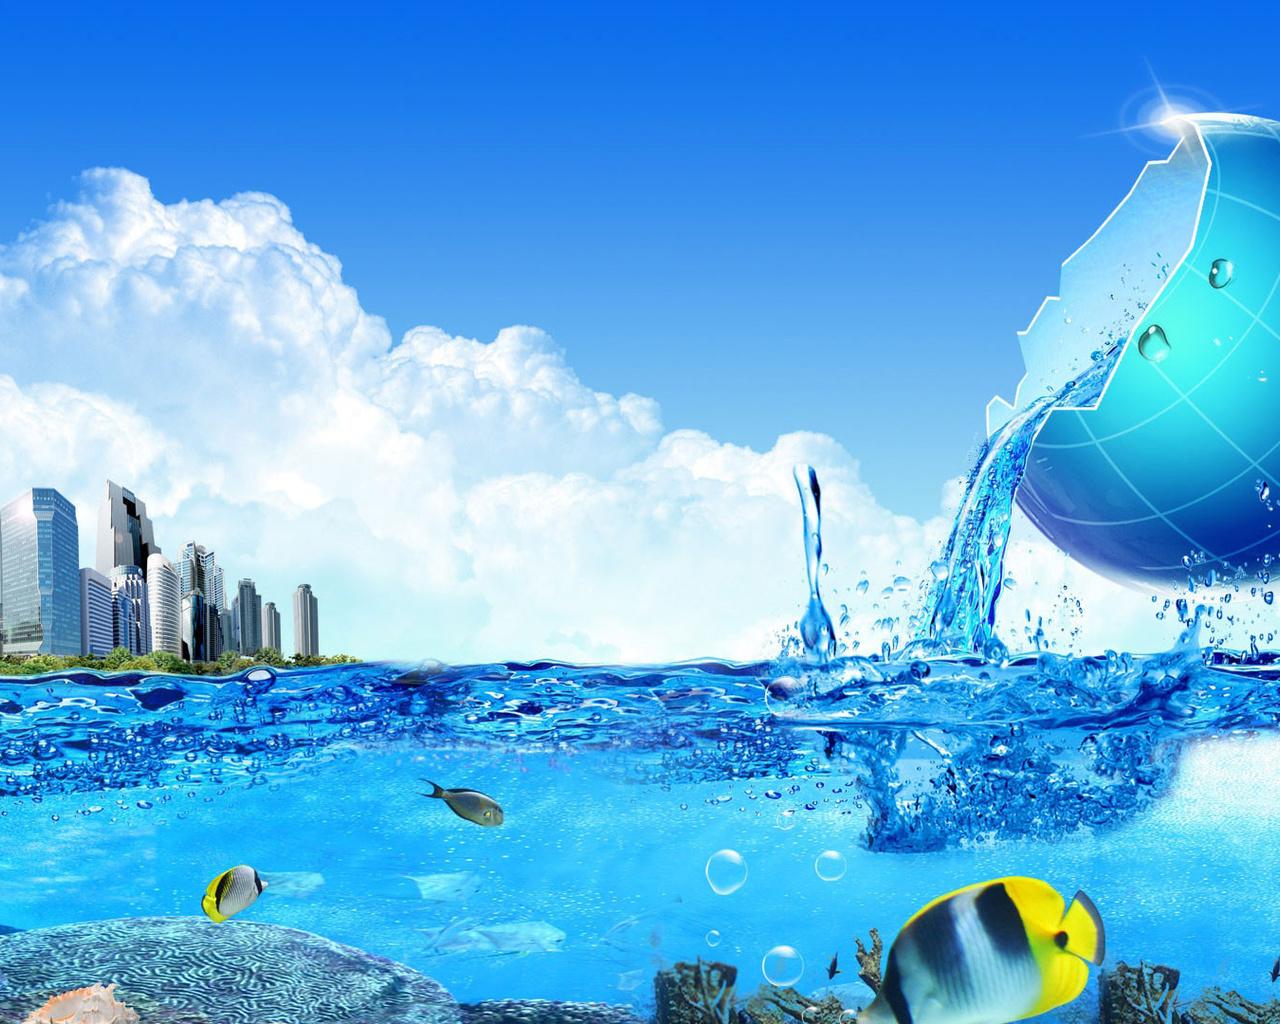 океан, остров, дома, рыбка